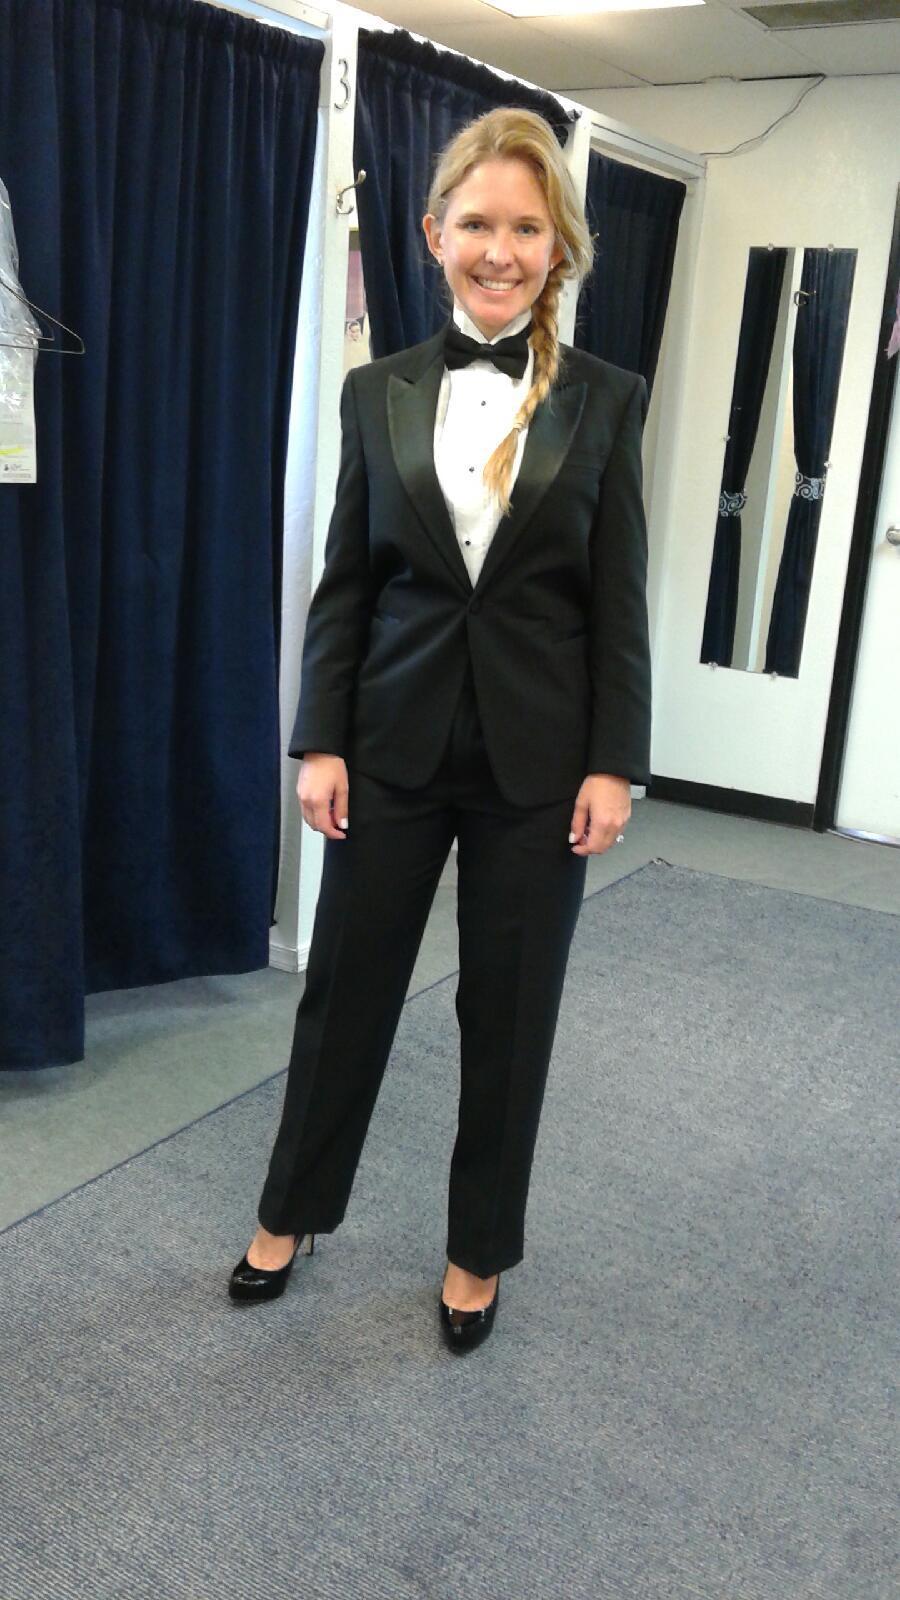 Women Prom Suits_Prom Dresses_dressesss